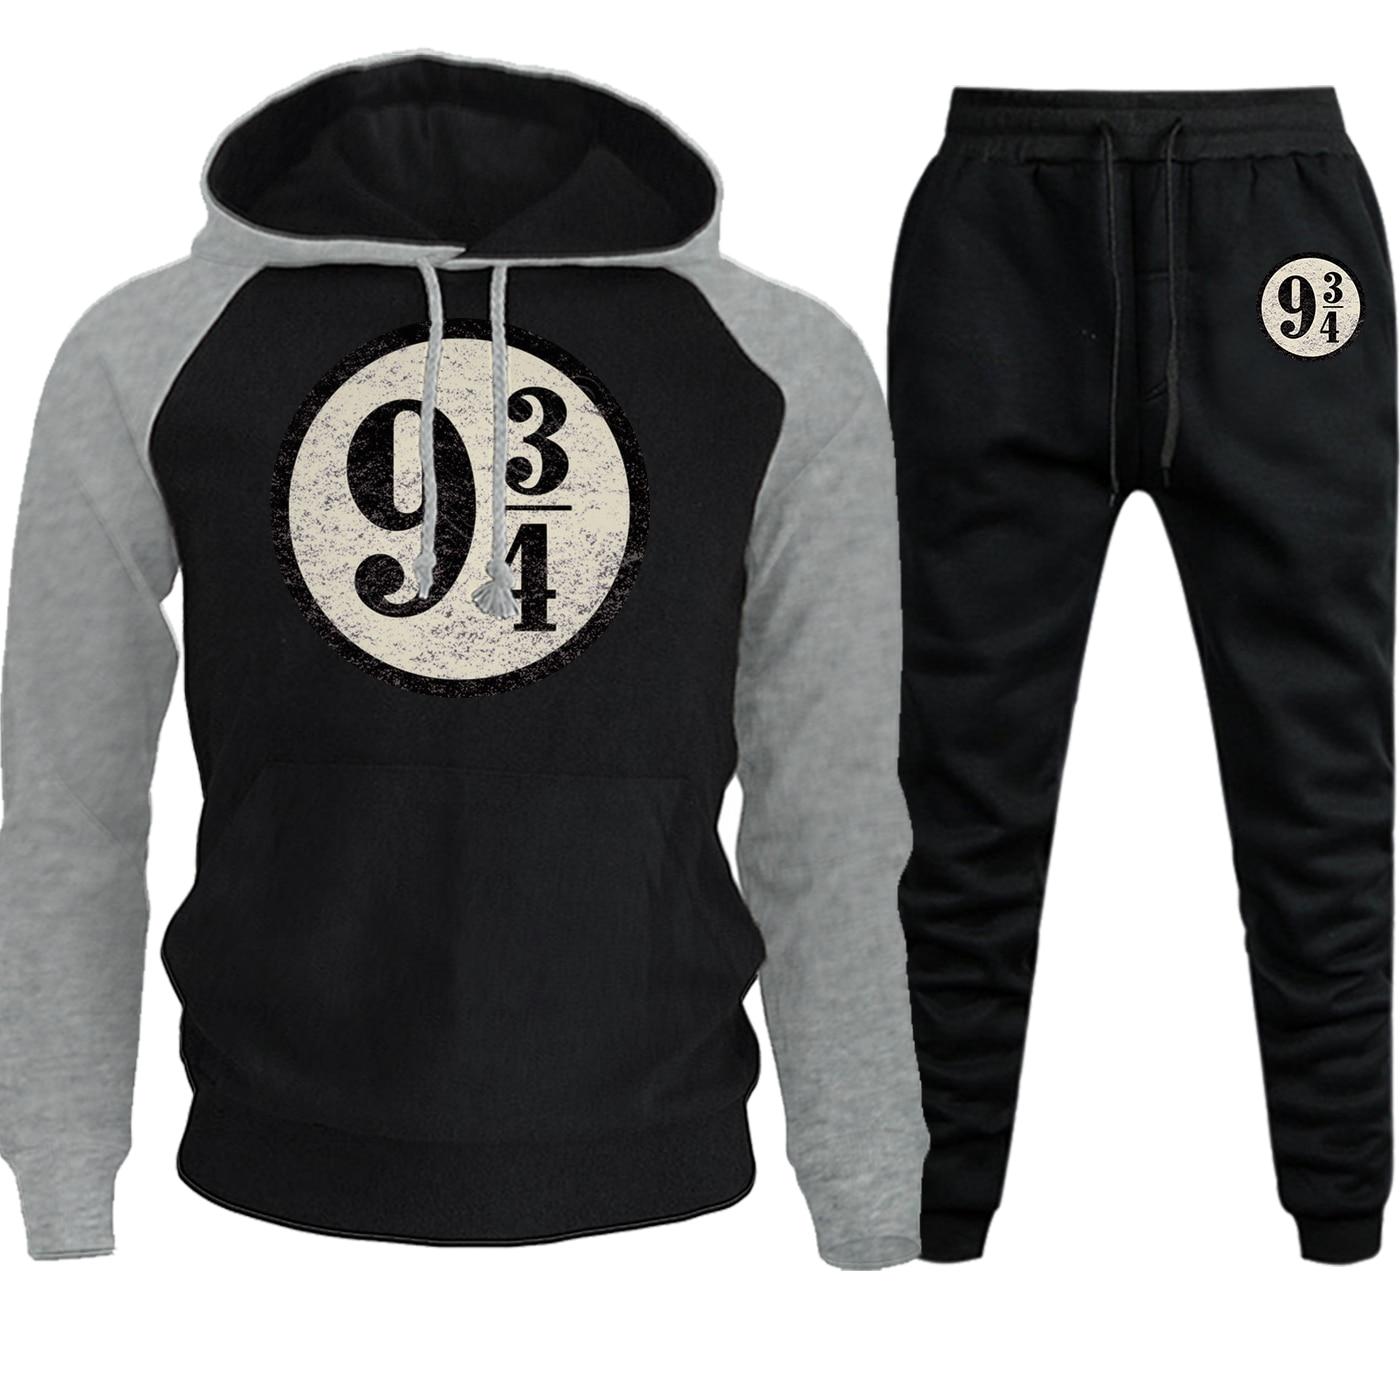 Nine And Three Quarters Autumn Winter Hot Sale Hoodie Raglan Men Sweatshirt Vintage Print Suit Fleece Pullover+Pants 2 Piece Set